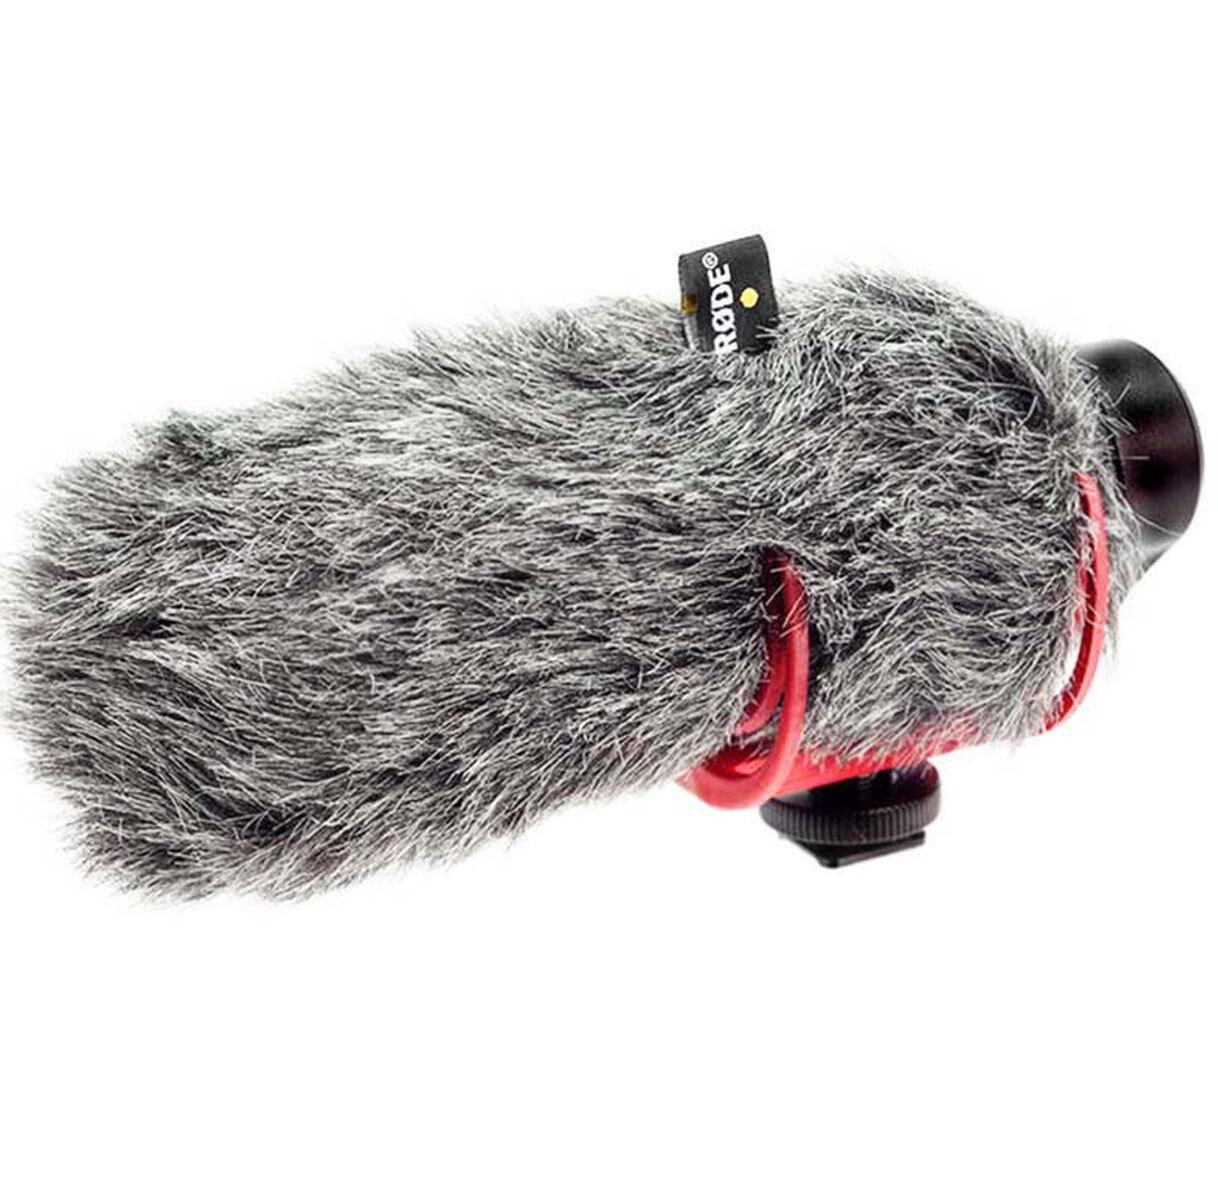 New Rode VideoMic GO hot Shoe On-Camera Shotgun Microphone + Rode VM GO Dead Cat 3